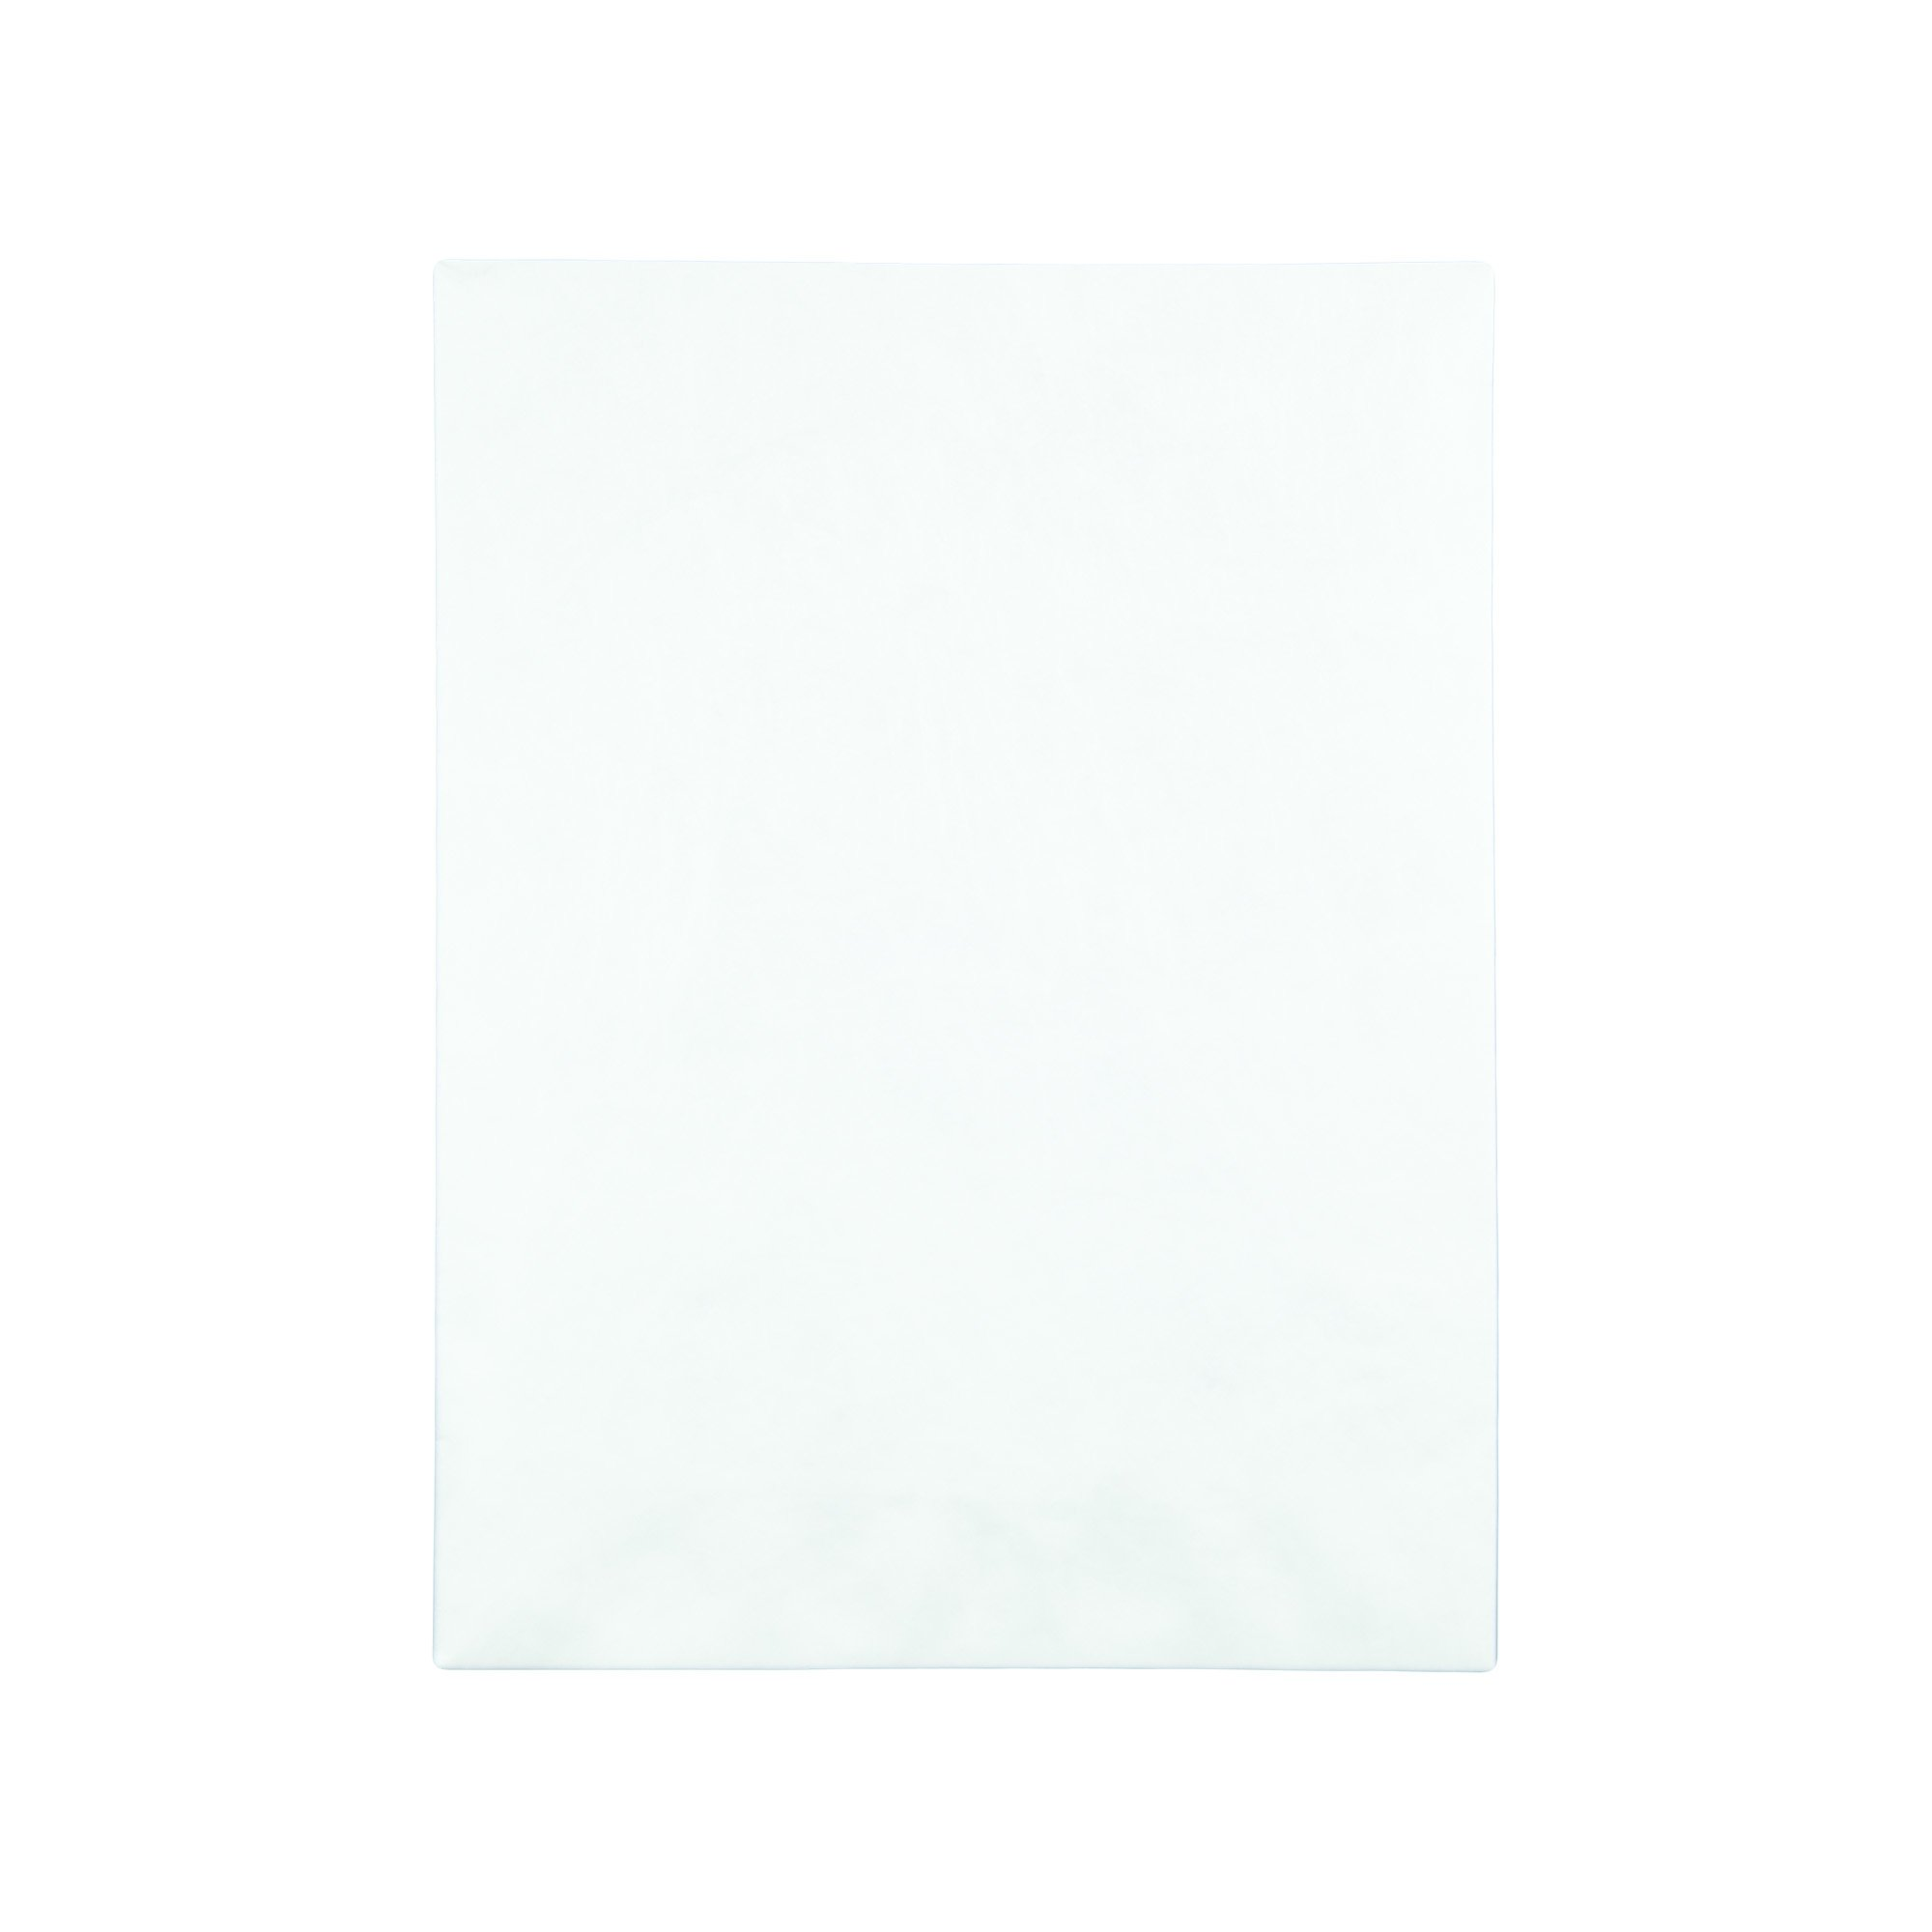 Quality Park Survivor R1460 Tyvek Mailer, 9 x 12, White (Box of 100) by Quality Park (Image #5)